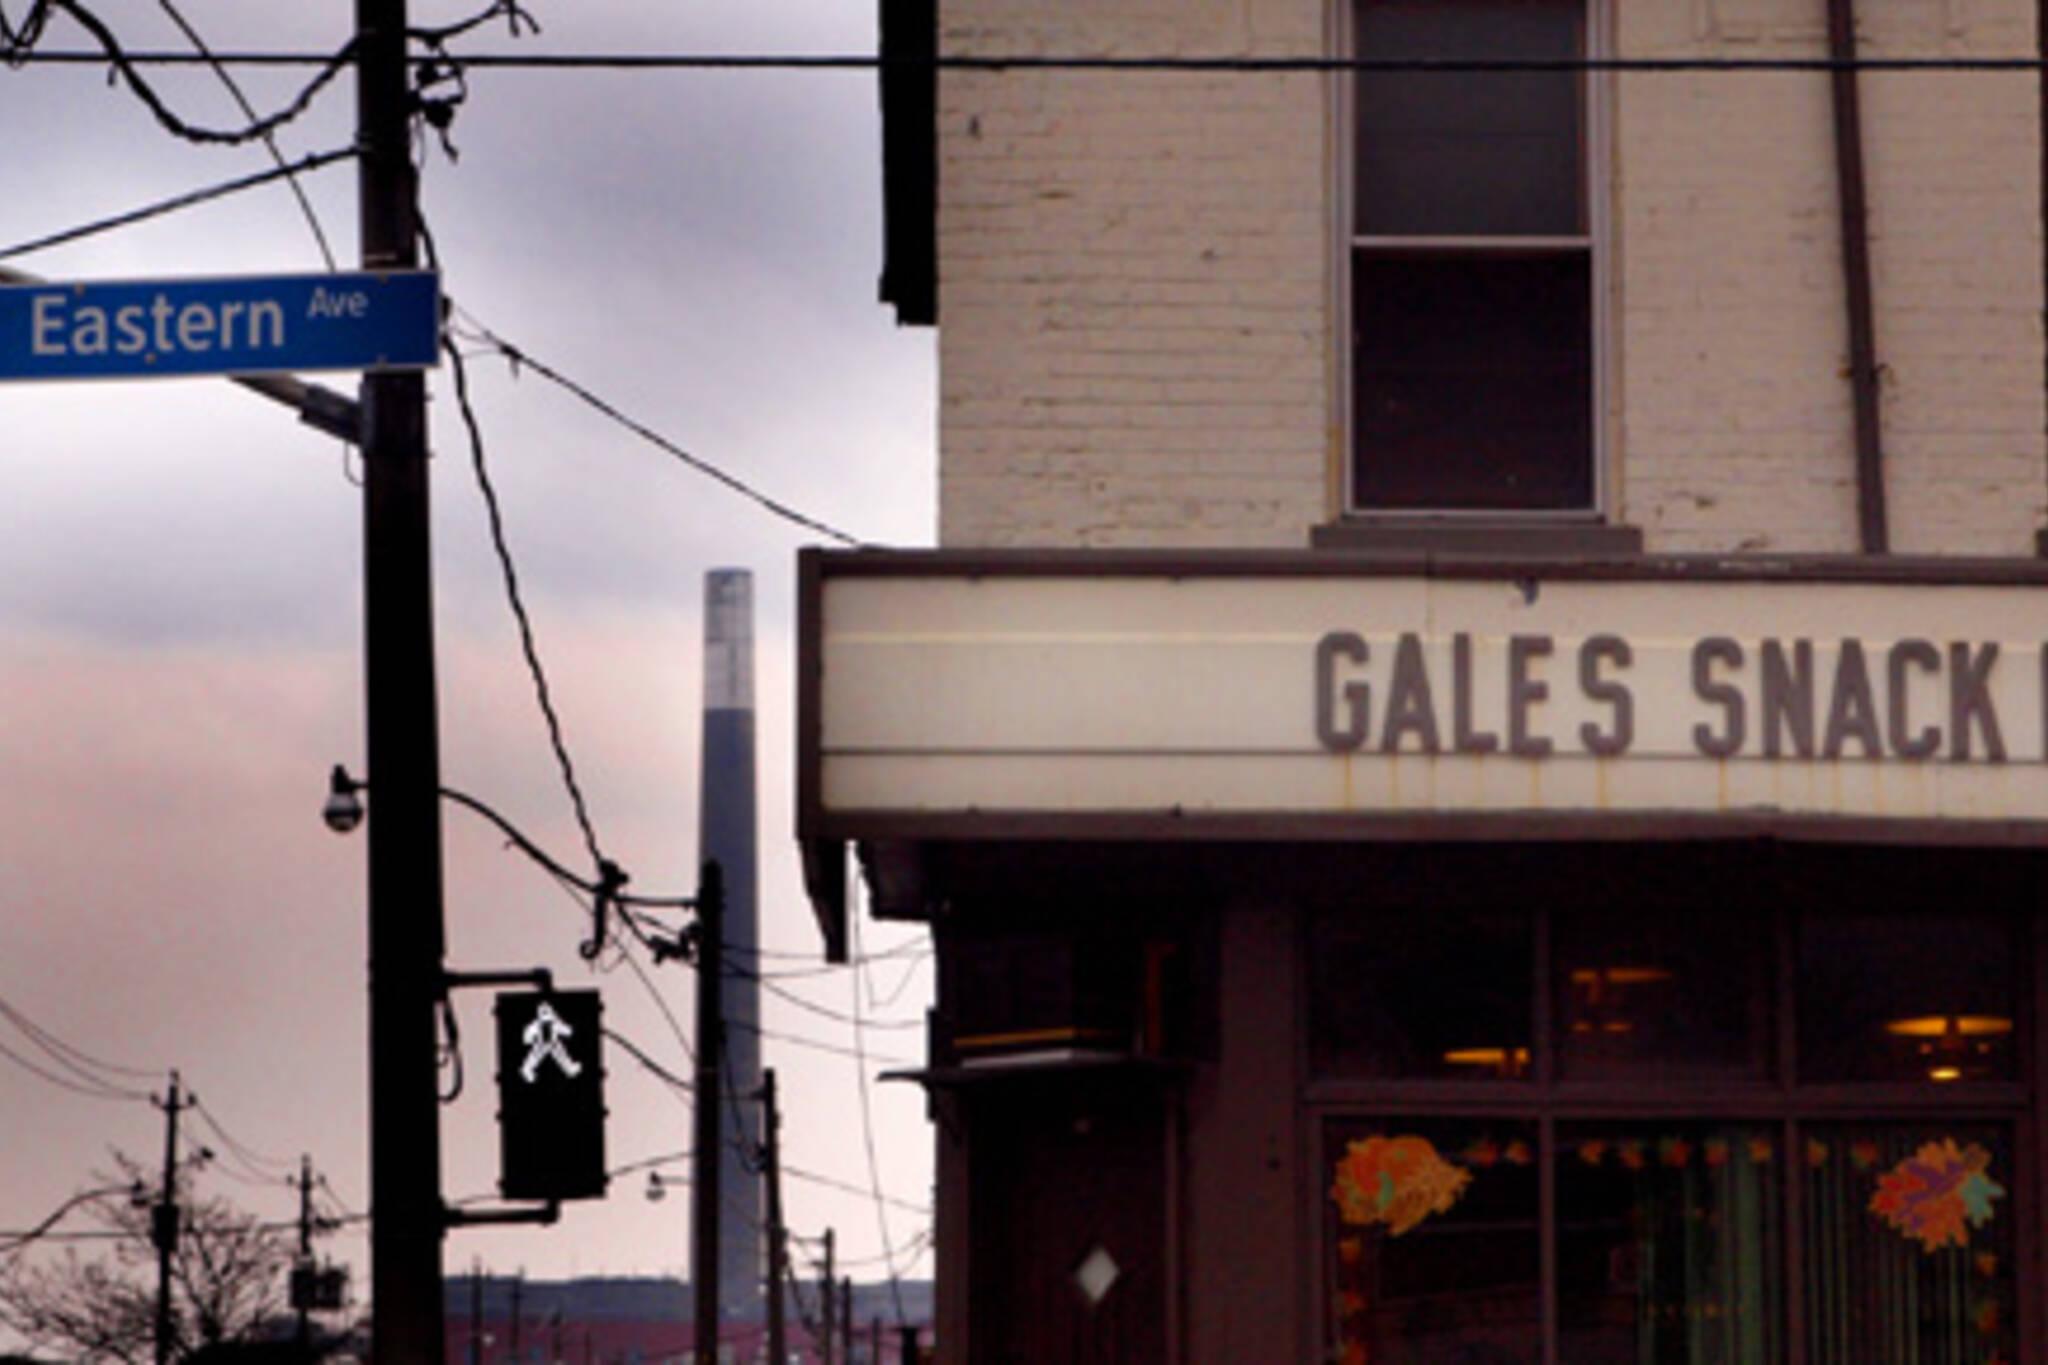 Gale's Snack Bar, an Eastern Avenue landmark